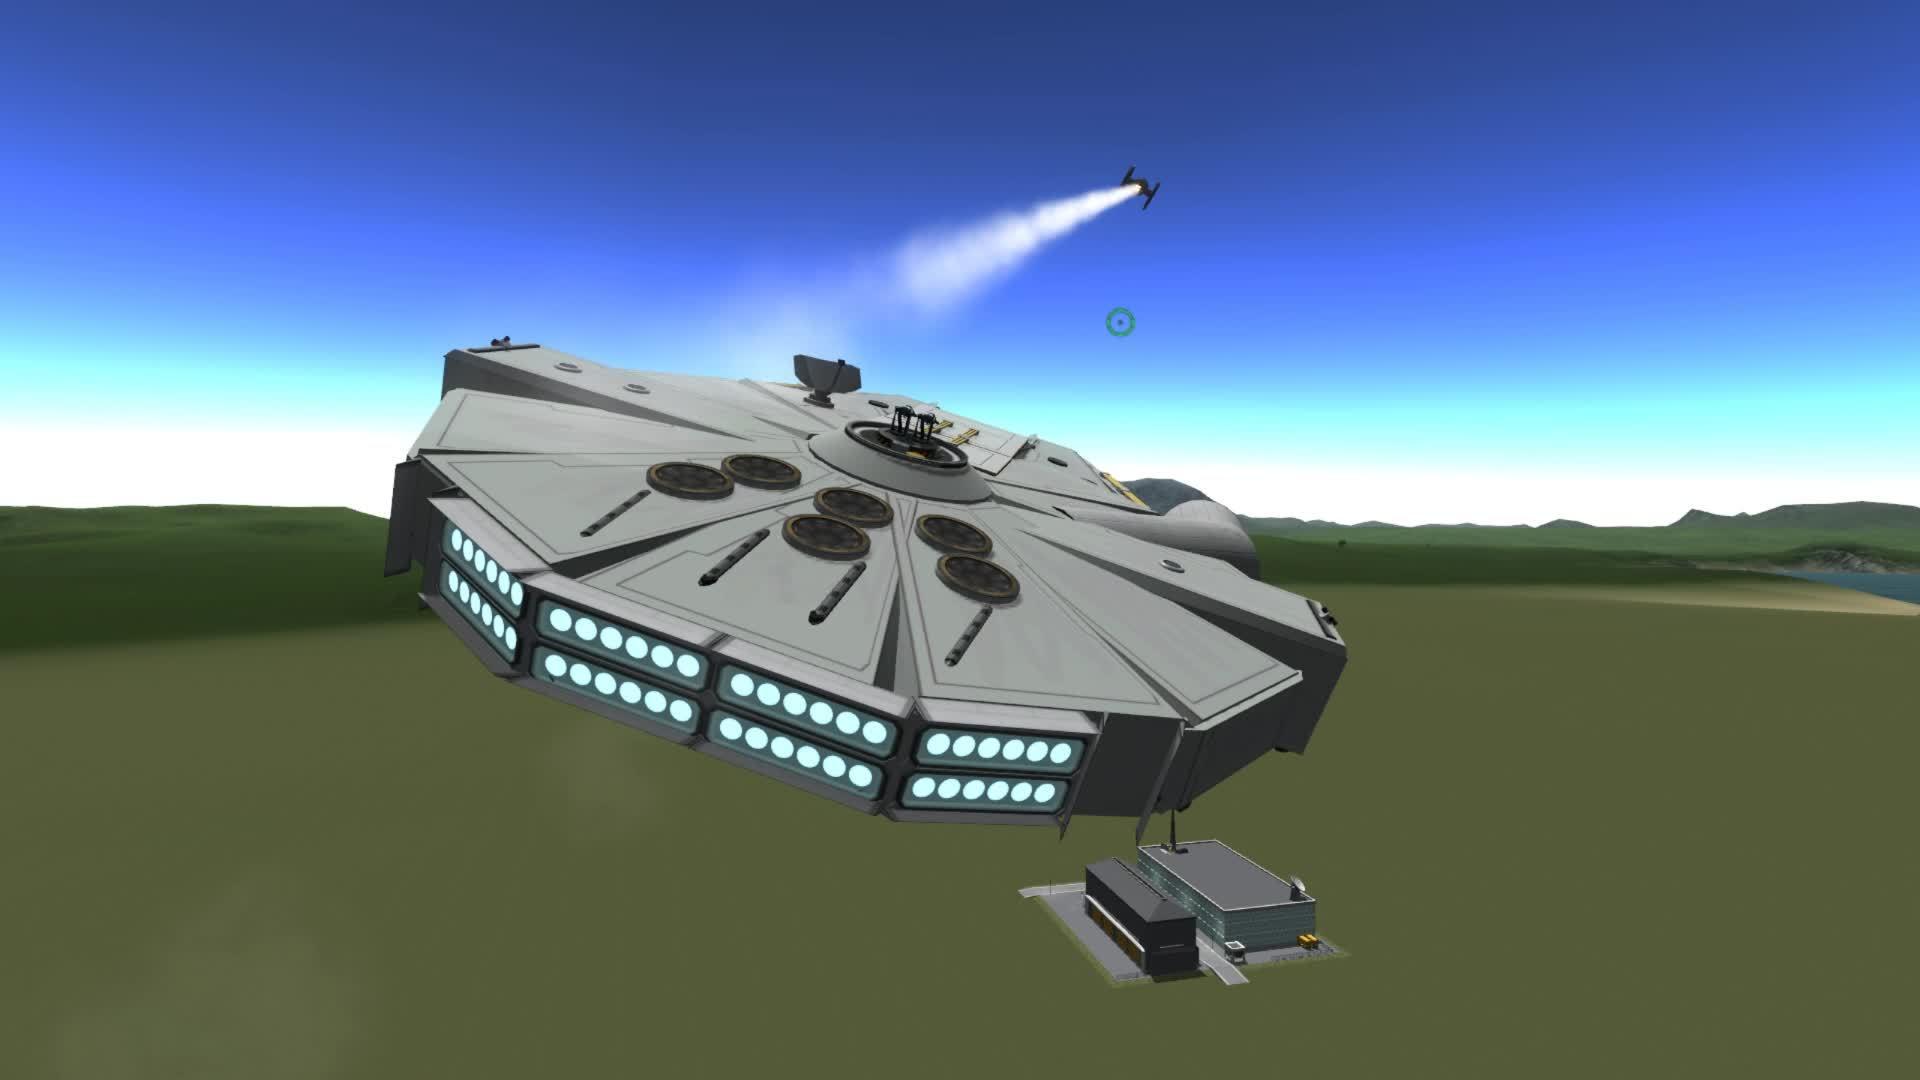 Star Wars, gaming, Millennium Falcon GIFs